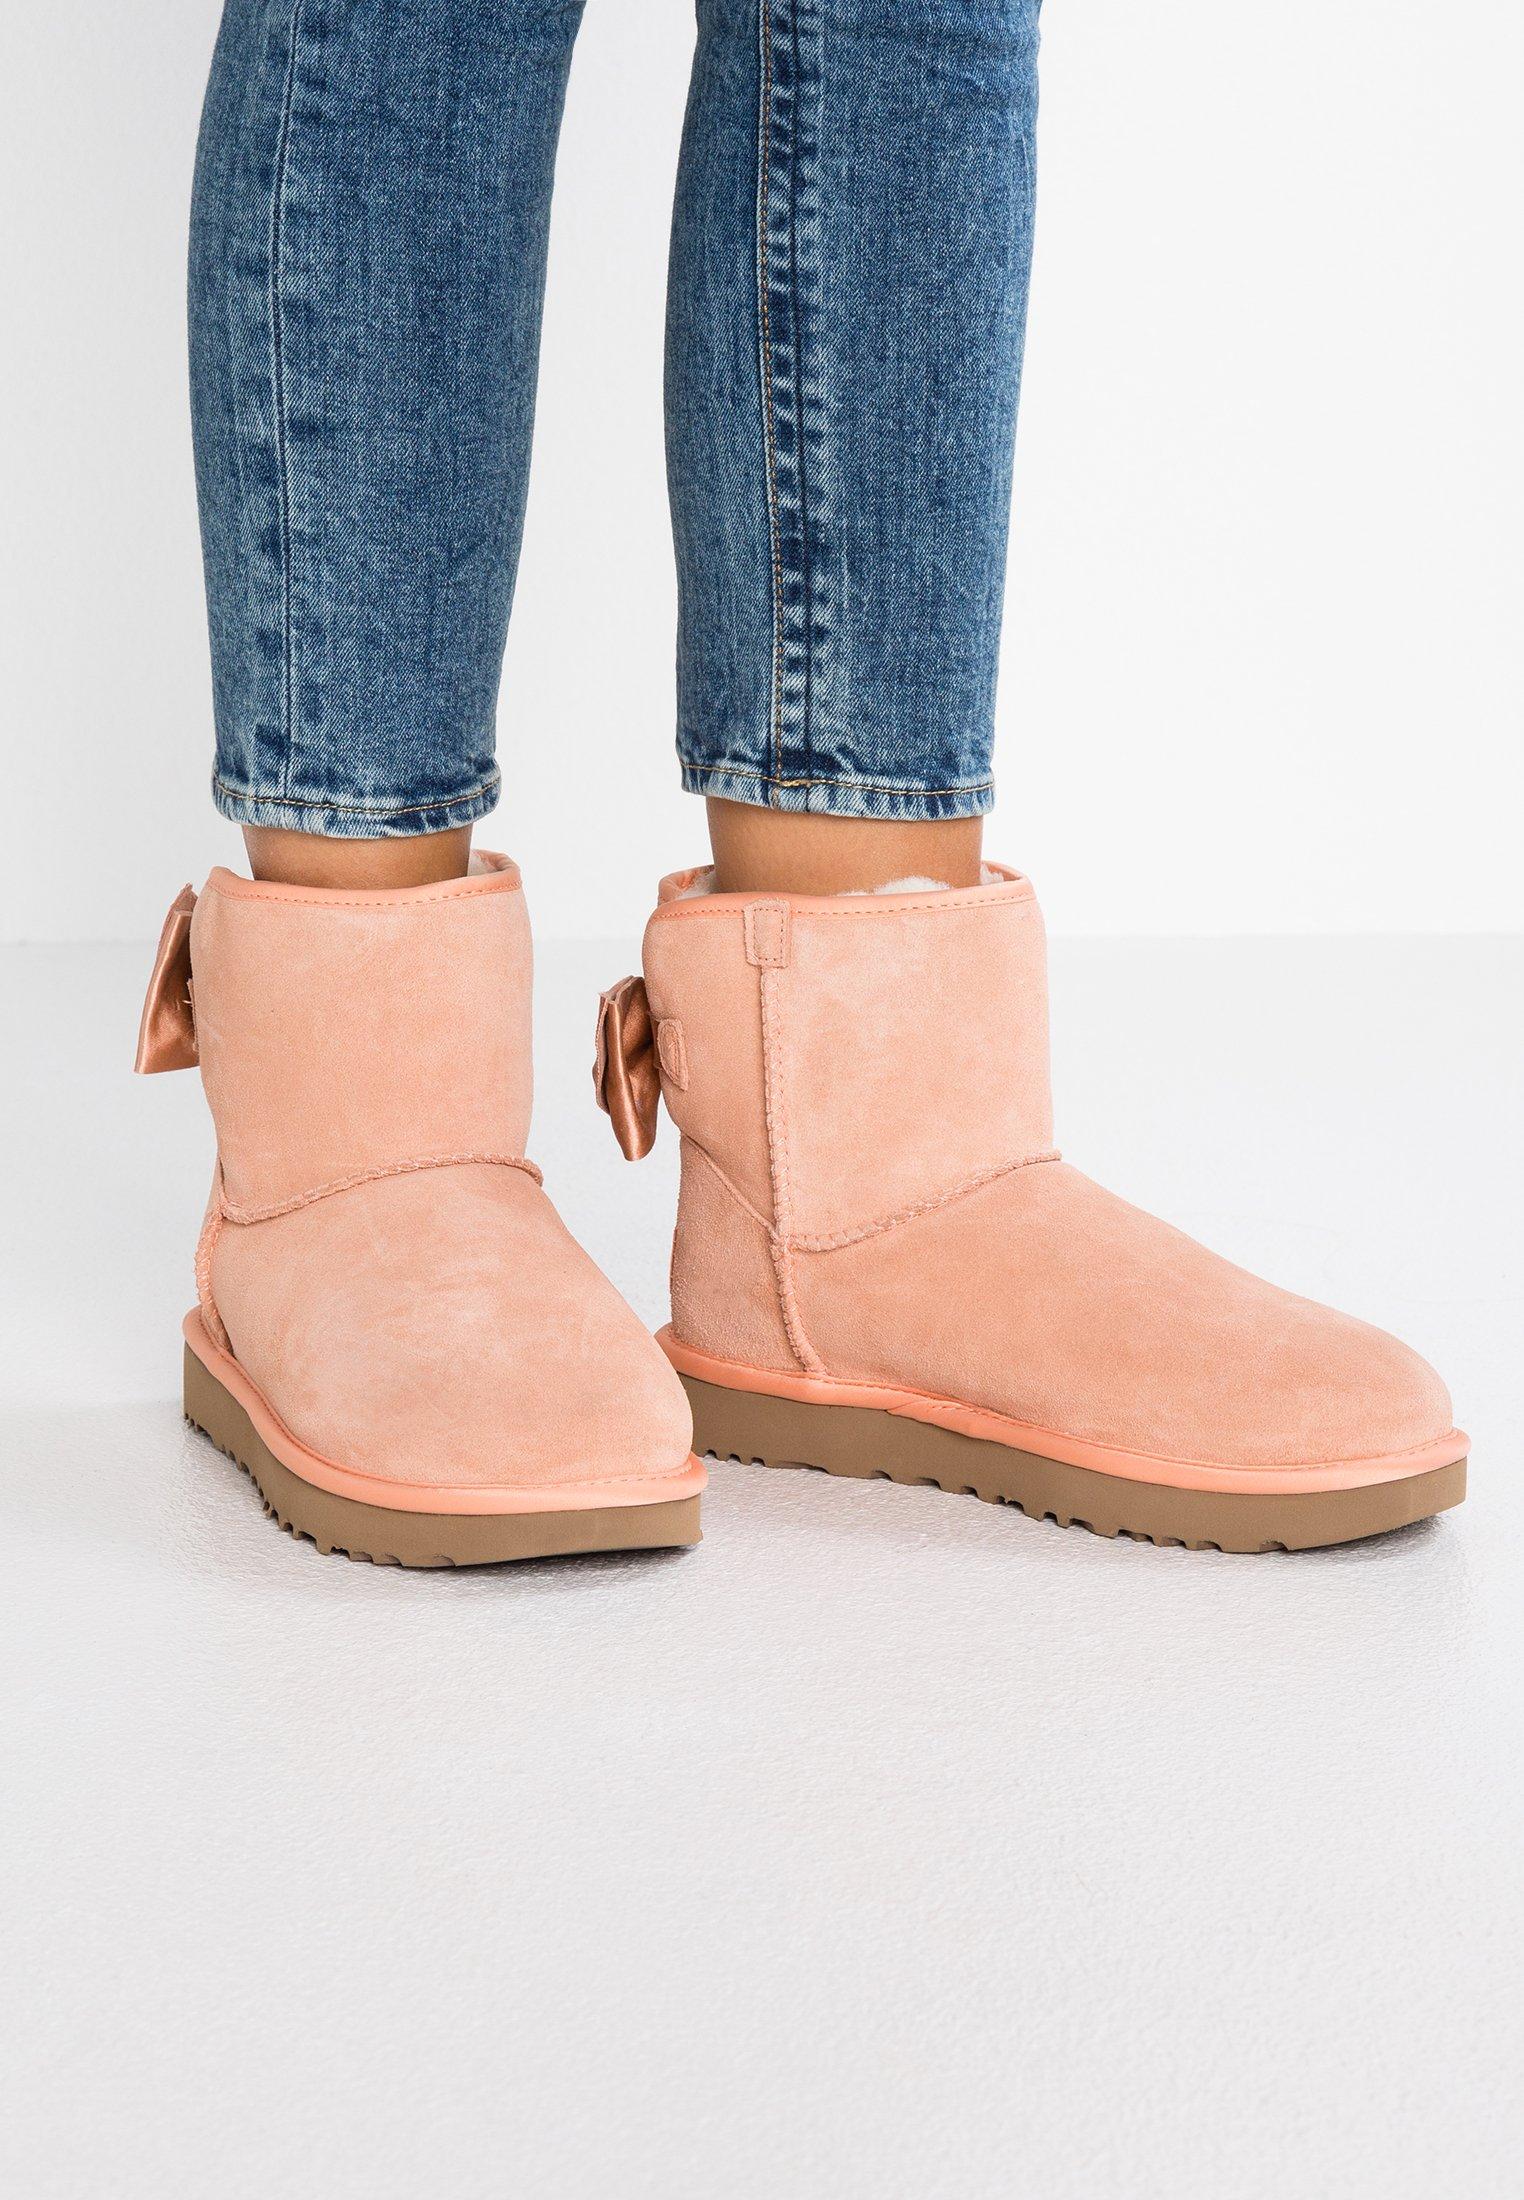 2013 Cheapest UGG SATIN BOW MINI - Classic ankle boots - suntan   women's shoes 2020 jIK6j